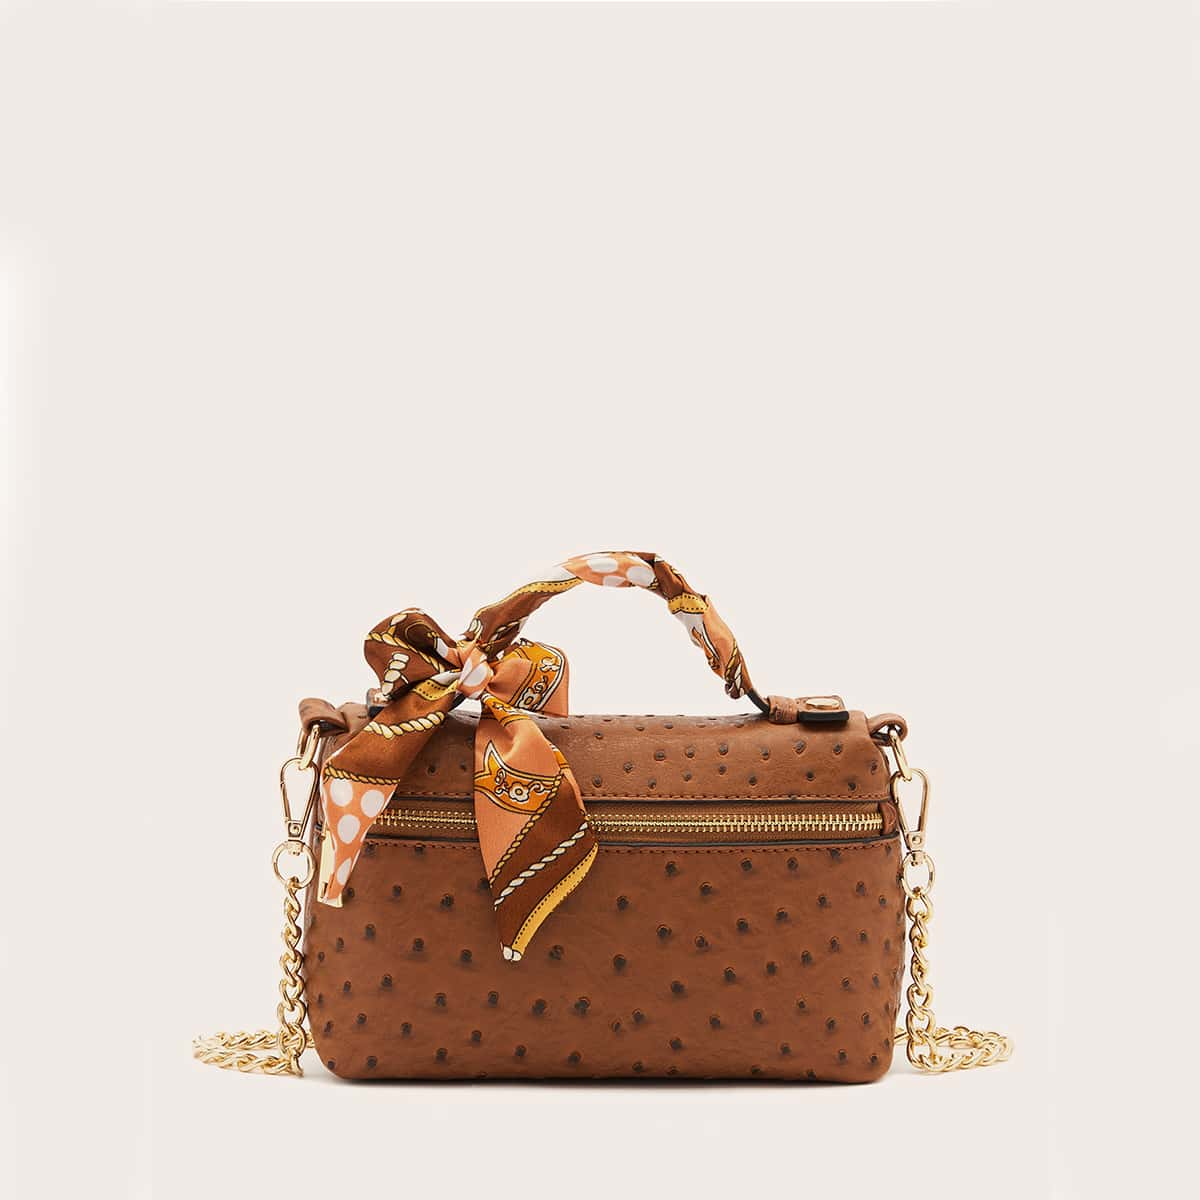 SHEIN / Twilly Scarf Decor Ostrich Embossed Chain Satchel Bag